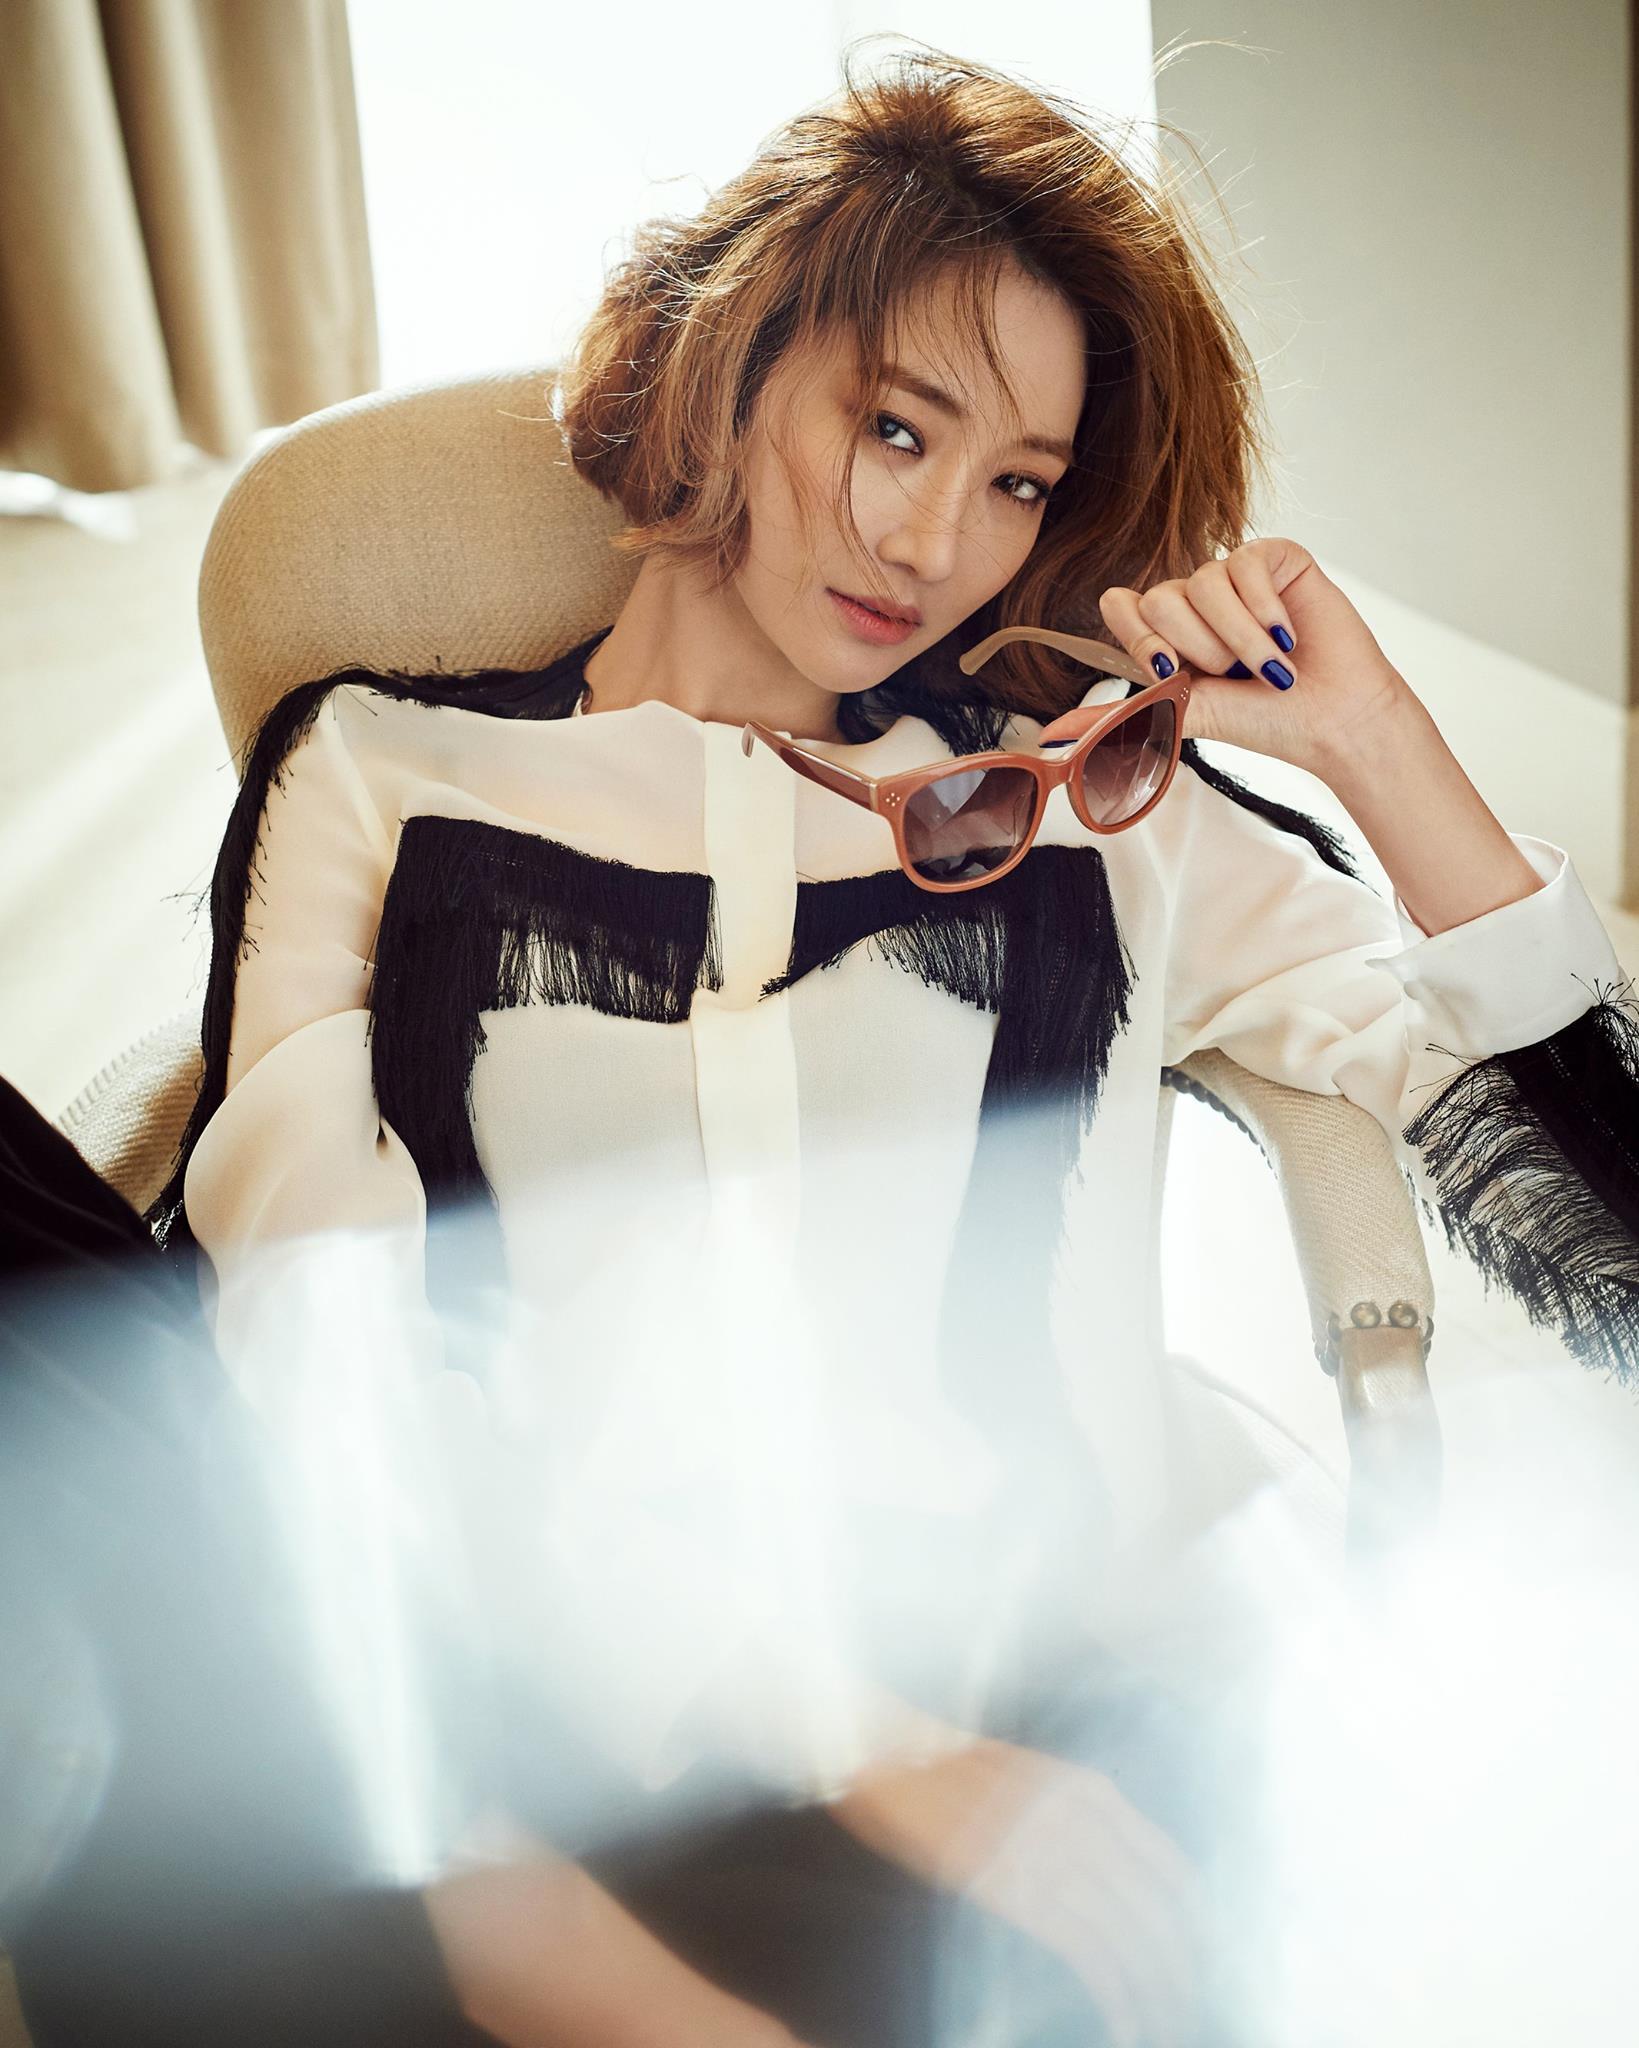 Go Joon Hee Is An Eyewear Muse In New Vogue Korea Pictorial Soompi